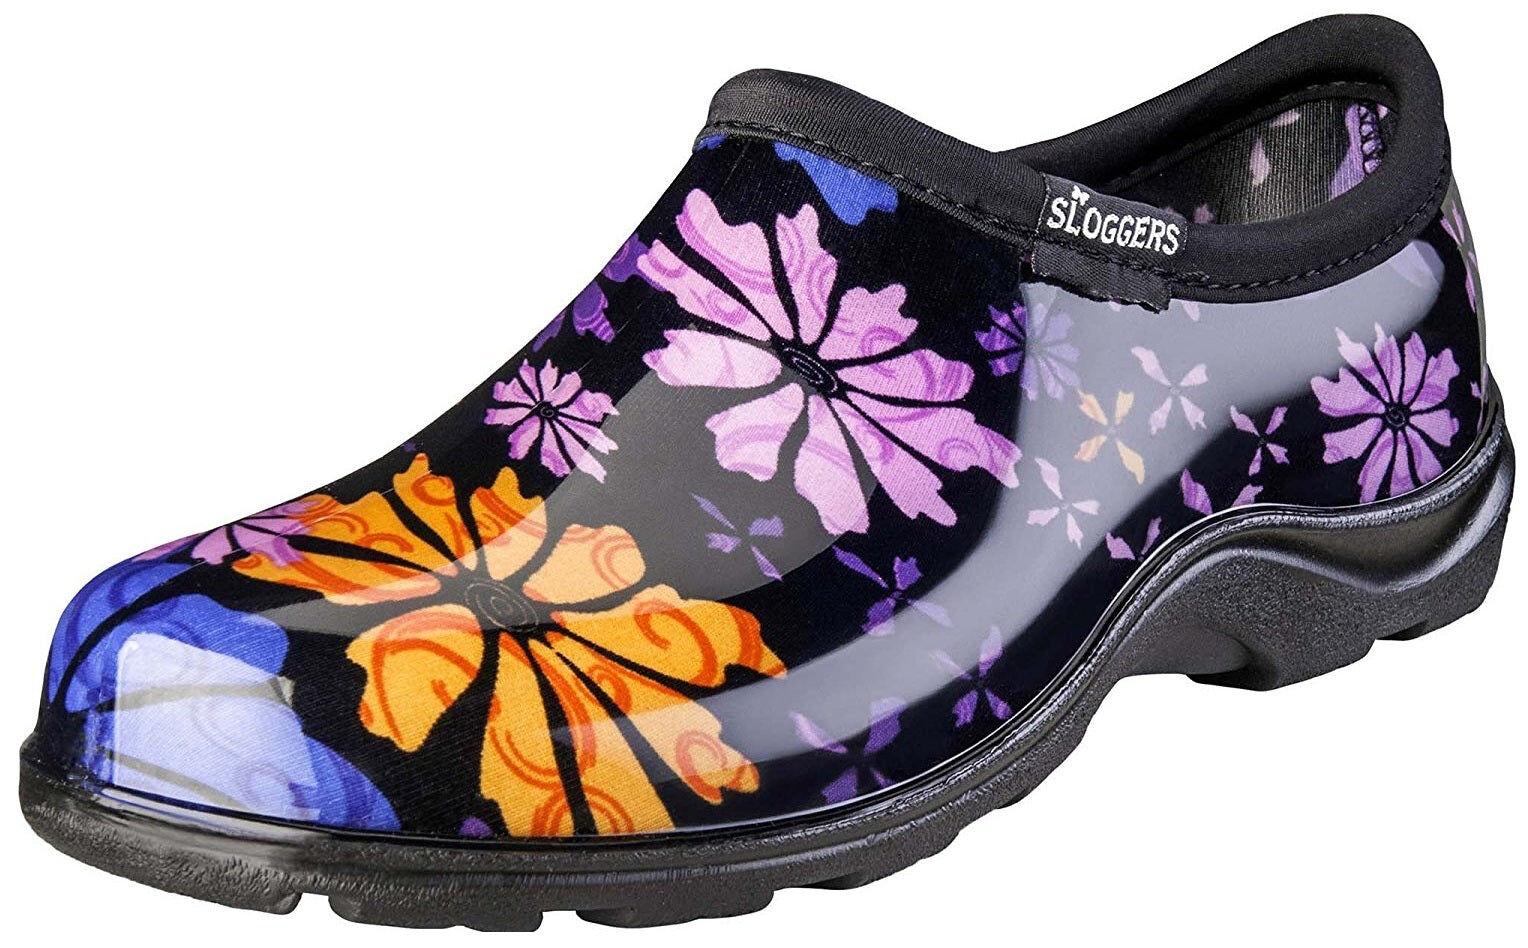 Sloggers 5116fp08 Flower Power Women's Rain And Garden Shoe, Size 8